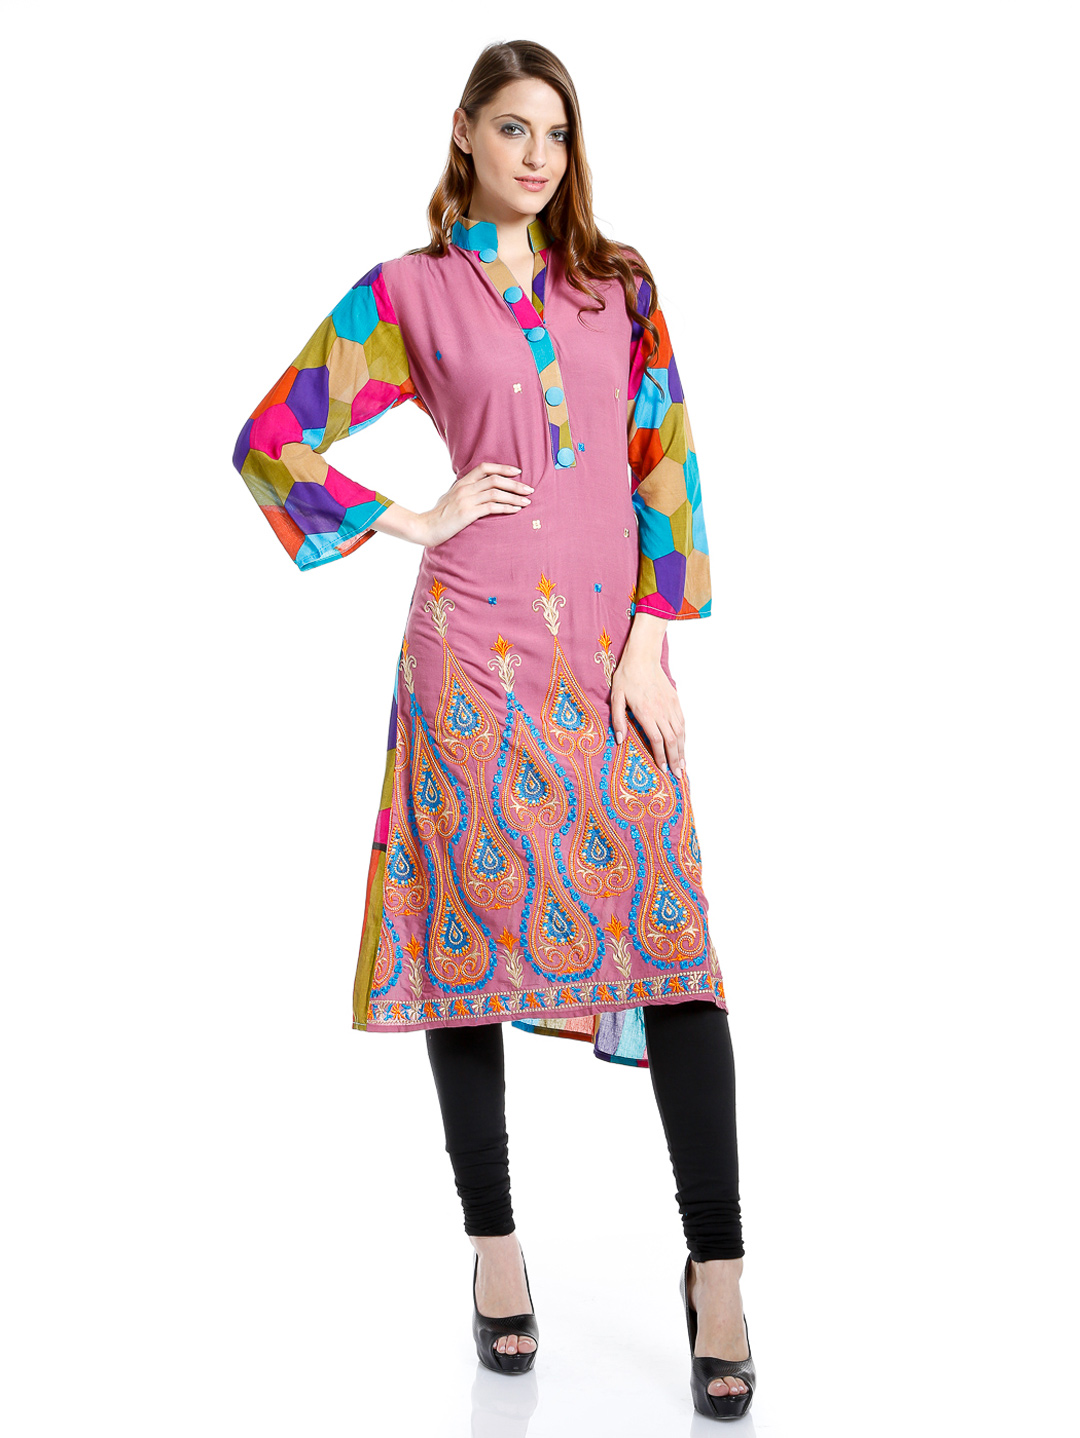 Shirt ke design - Pocket Style Long Shirts Folding Long Kameez With Churidaar Trouser Clothing9 Blog